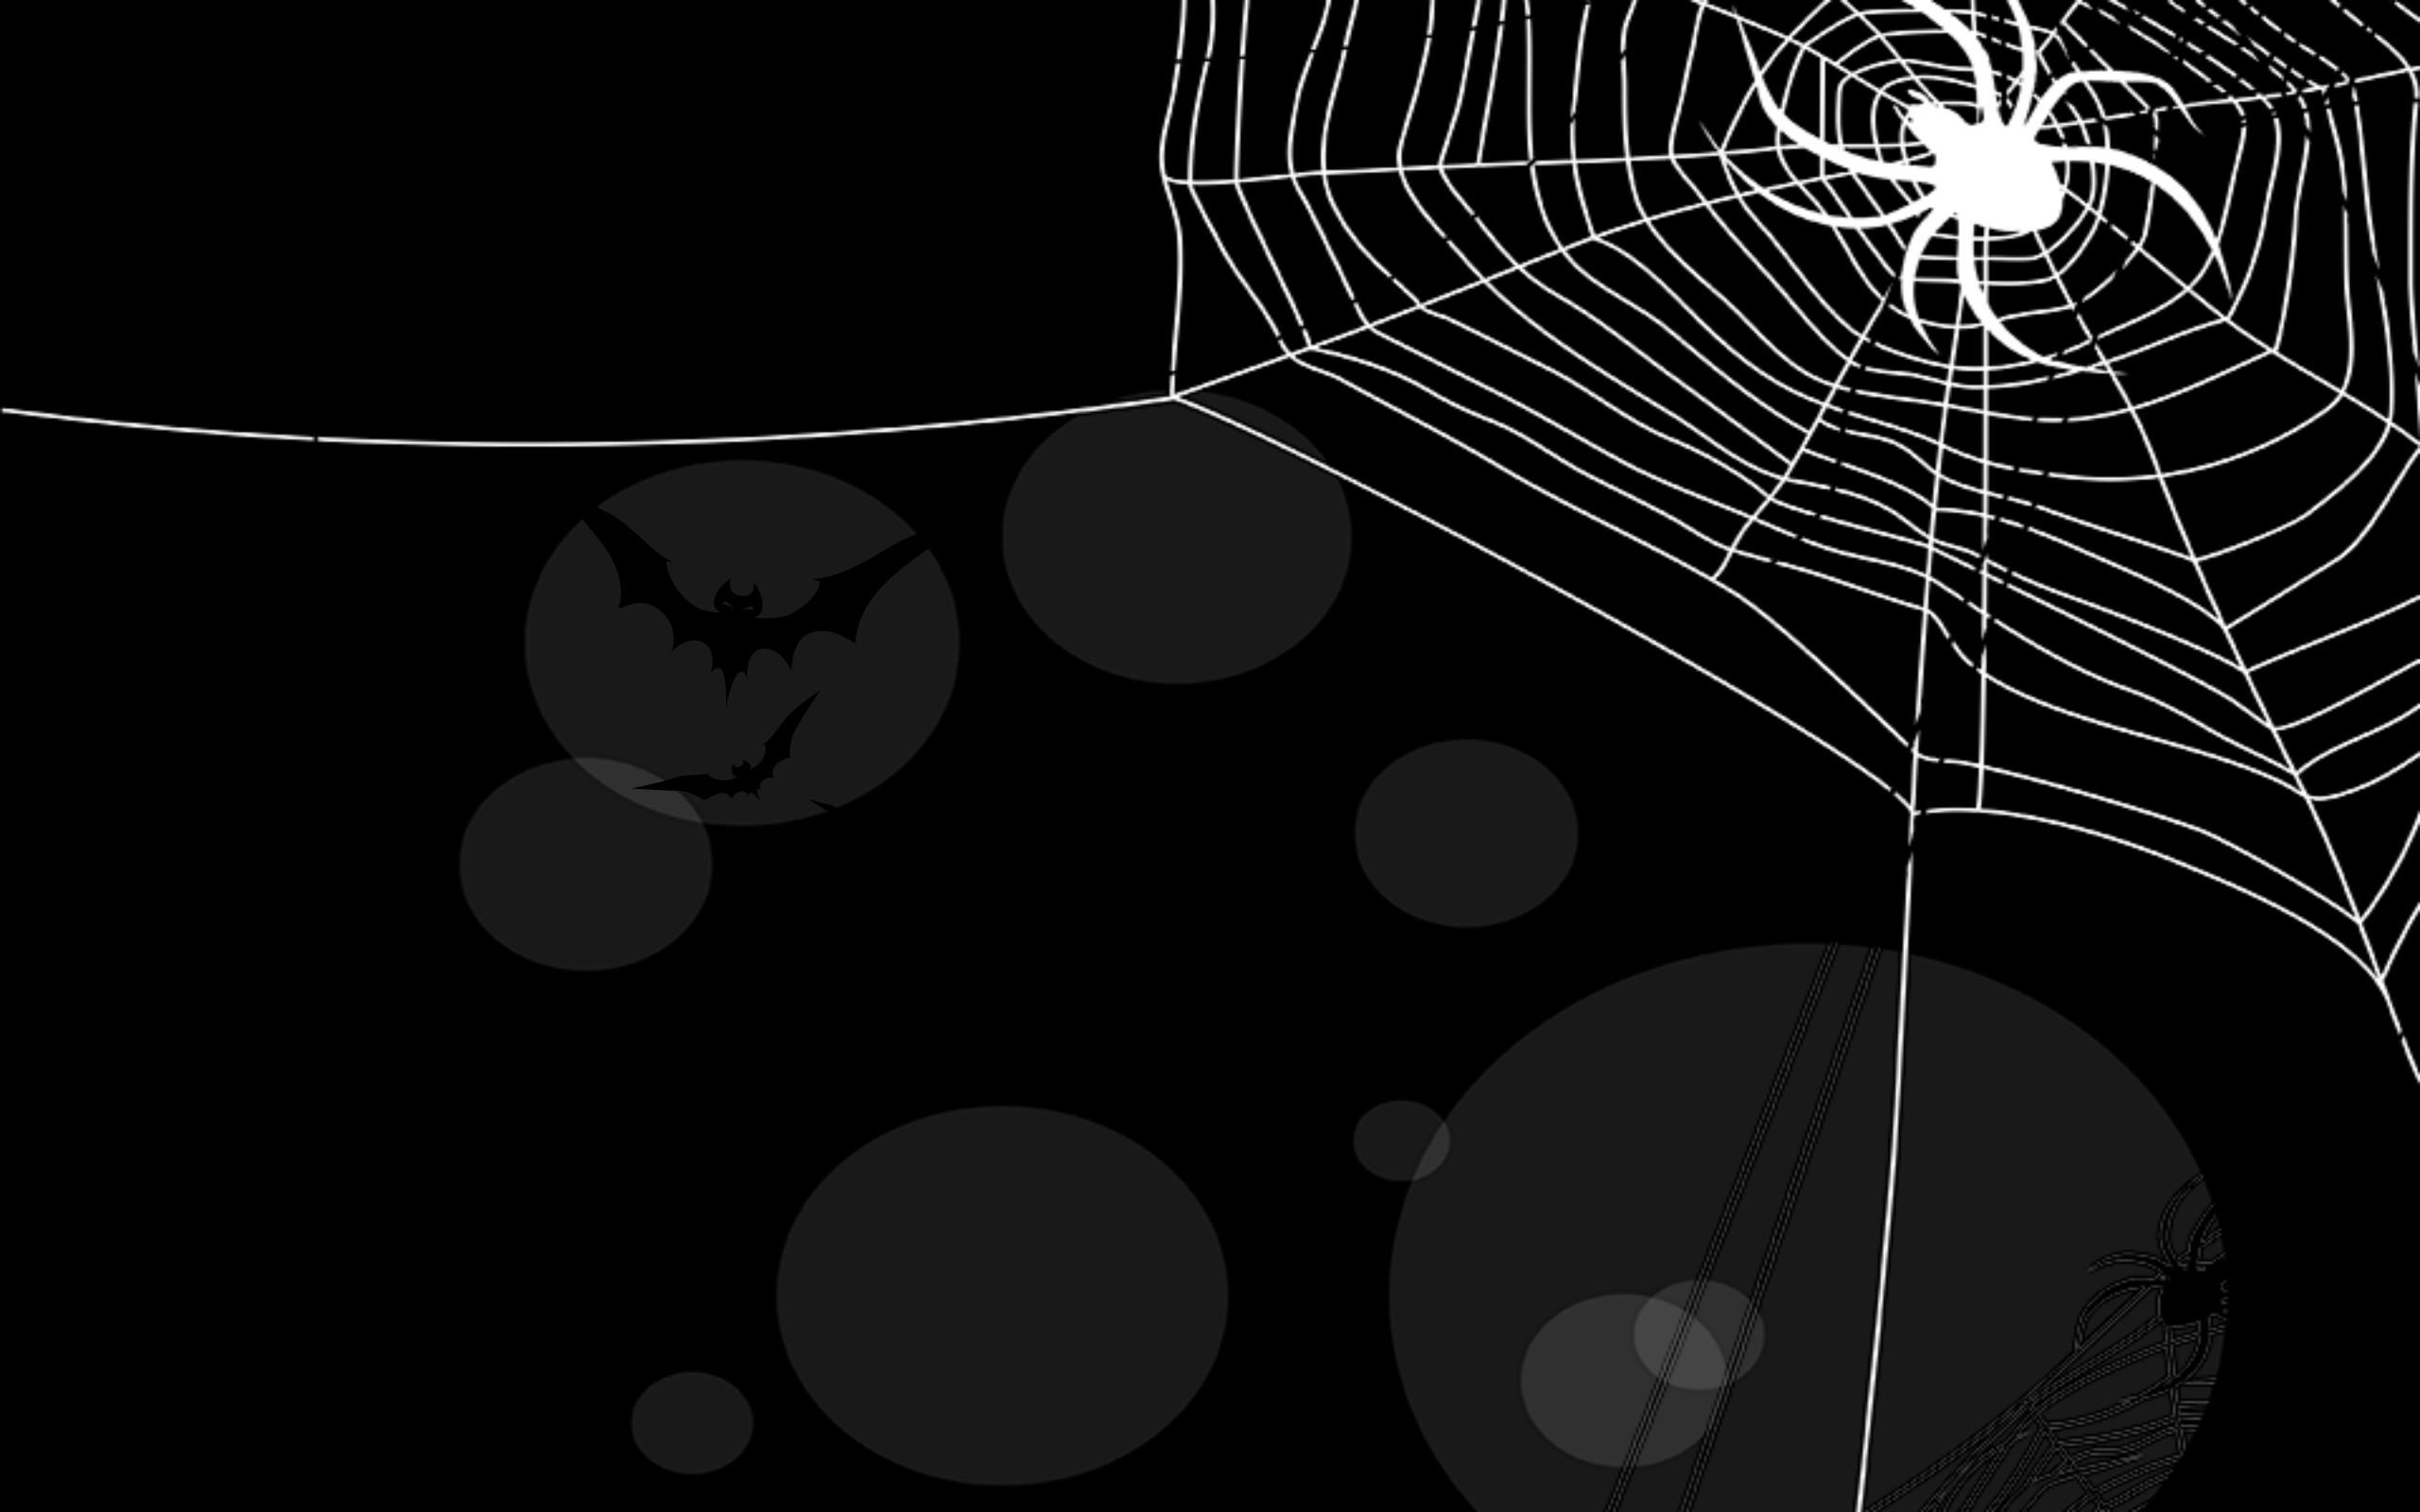 Bats Wallpapers